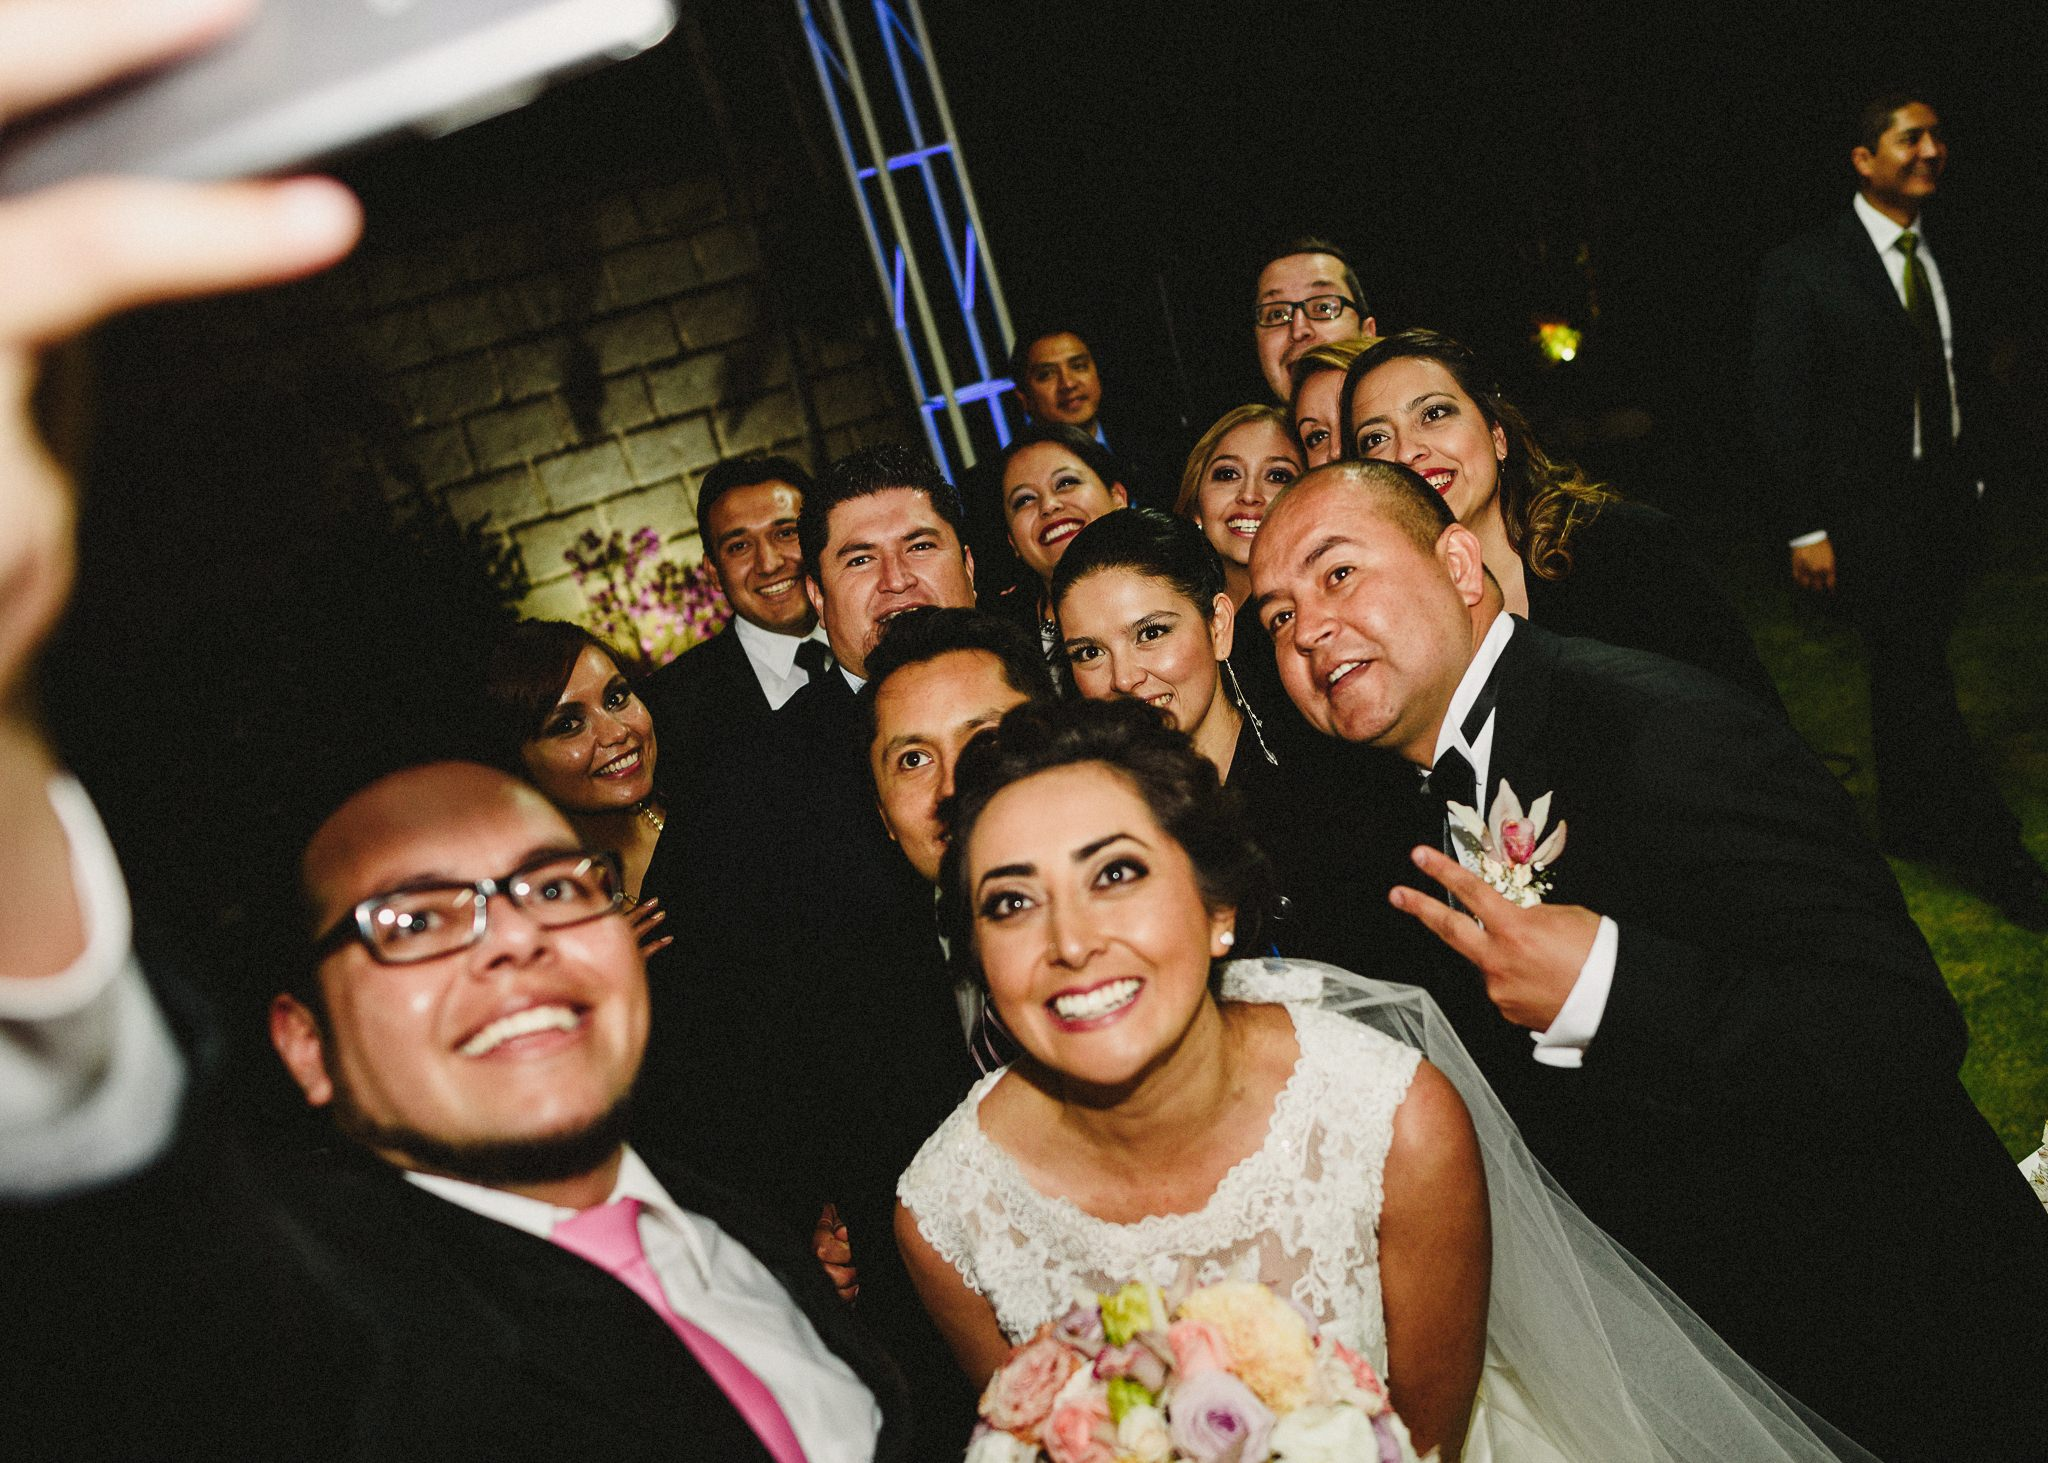 Wedding-Boda-Tulancingo-Hidalgo-Salon-Essenzia-Luis-Houdin-42-film